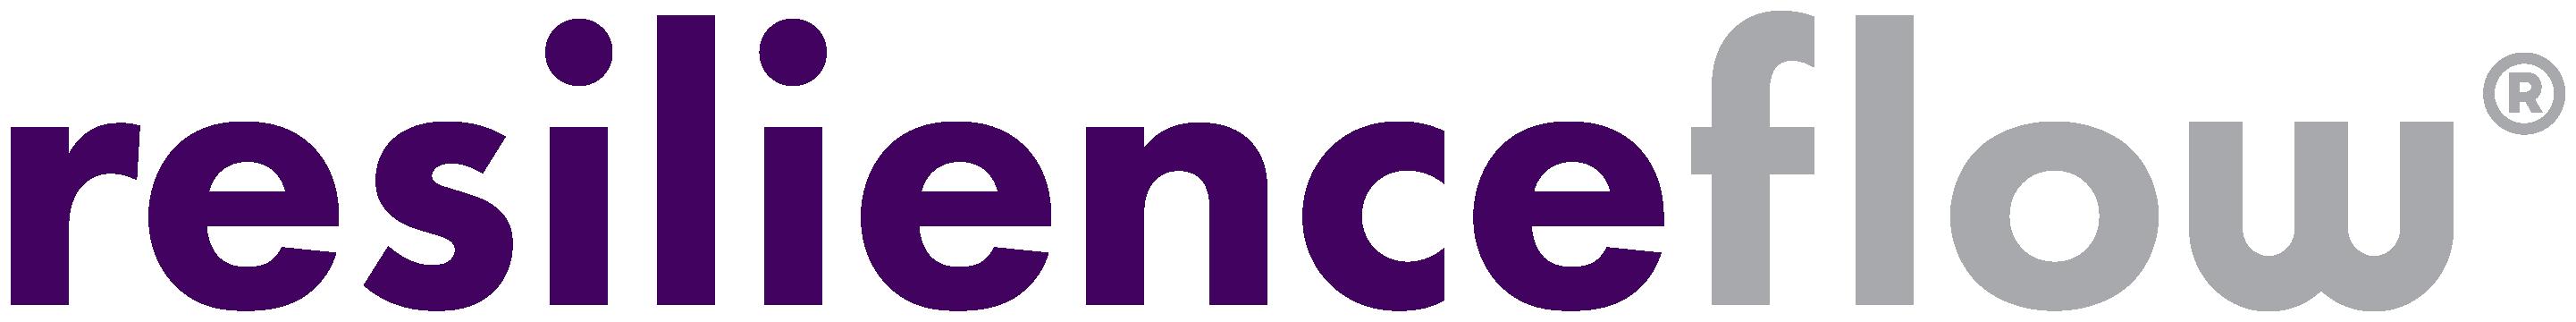 resilienceflow®-logo-plum-grey-600dpi